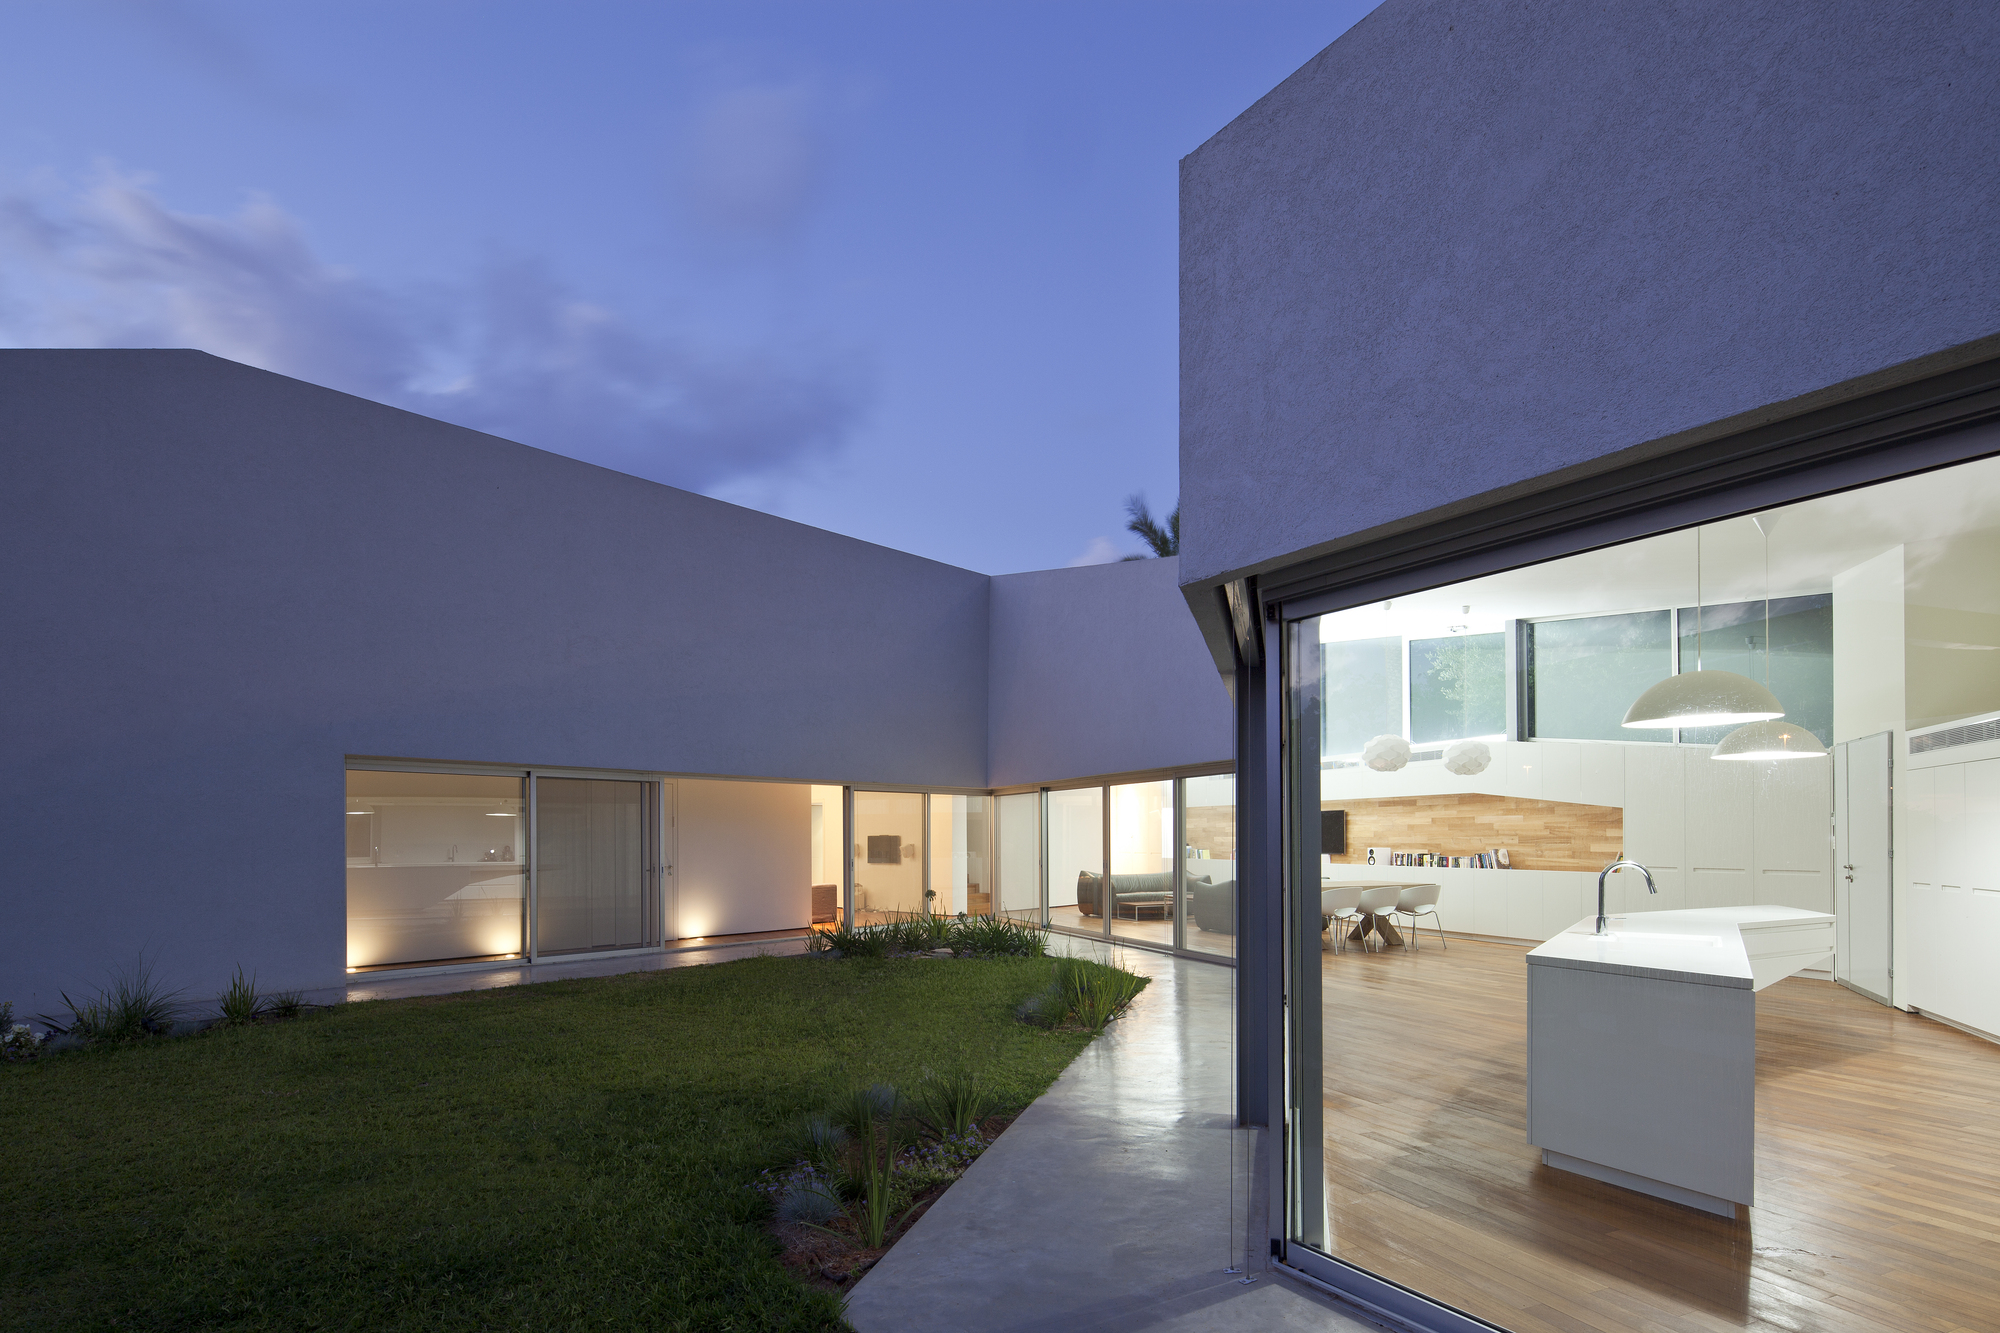 Habitação em Hofit / Paritzki & Liani Architects, © Amit Geron